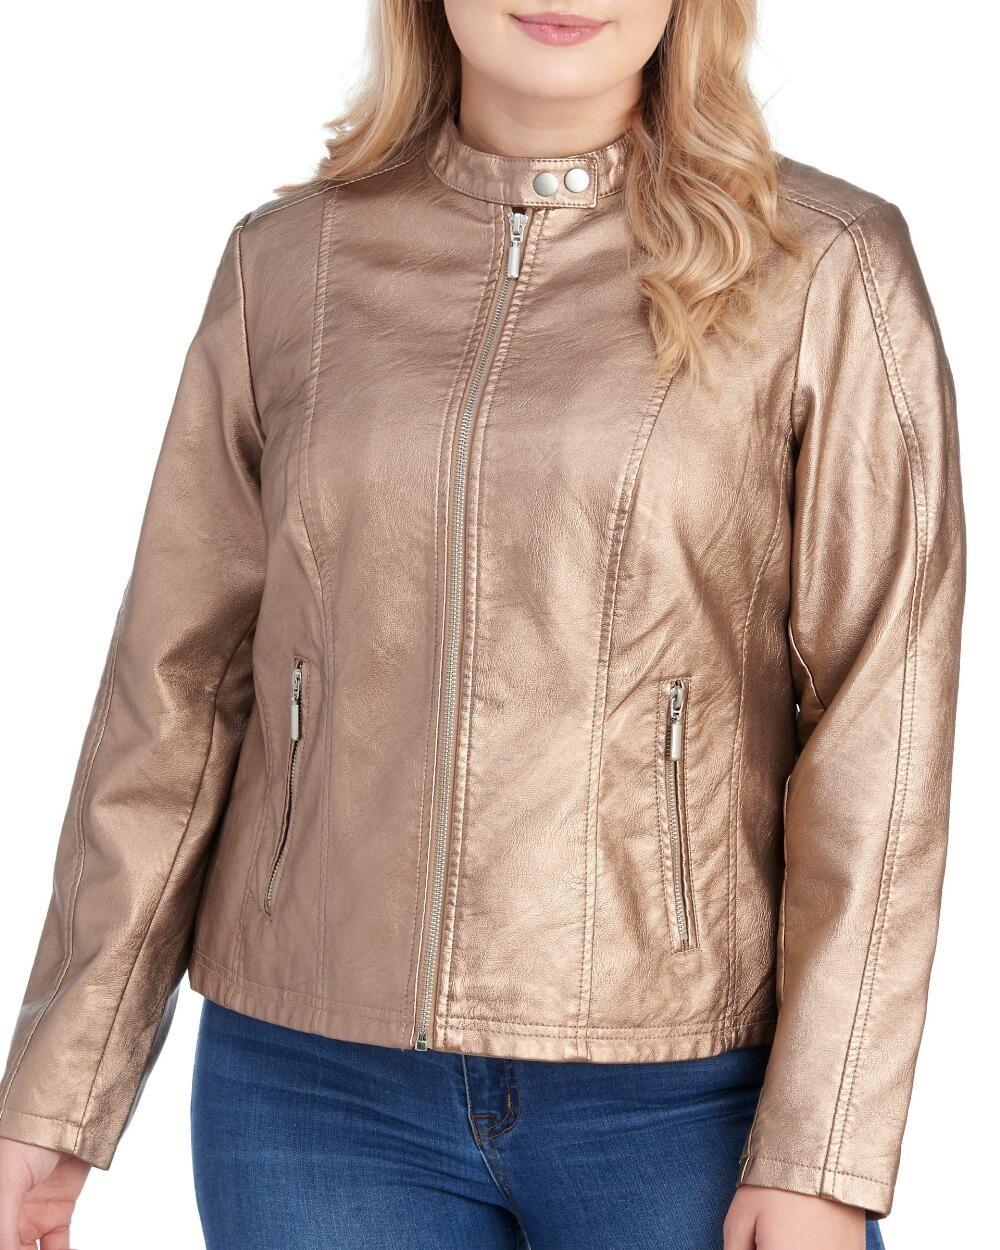 Women's Plus Size Faux Leather Moto Jacket Jackets, Moto